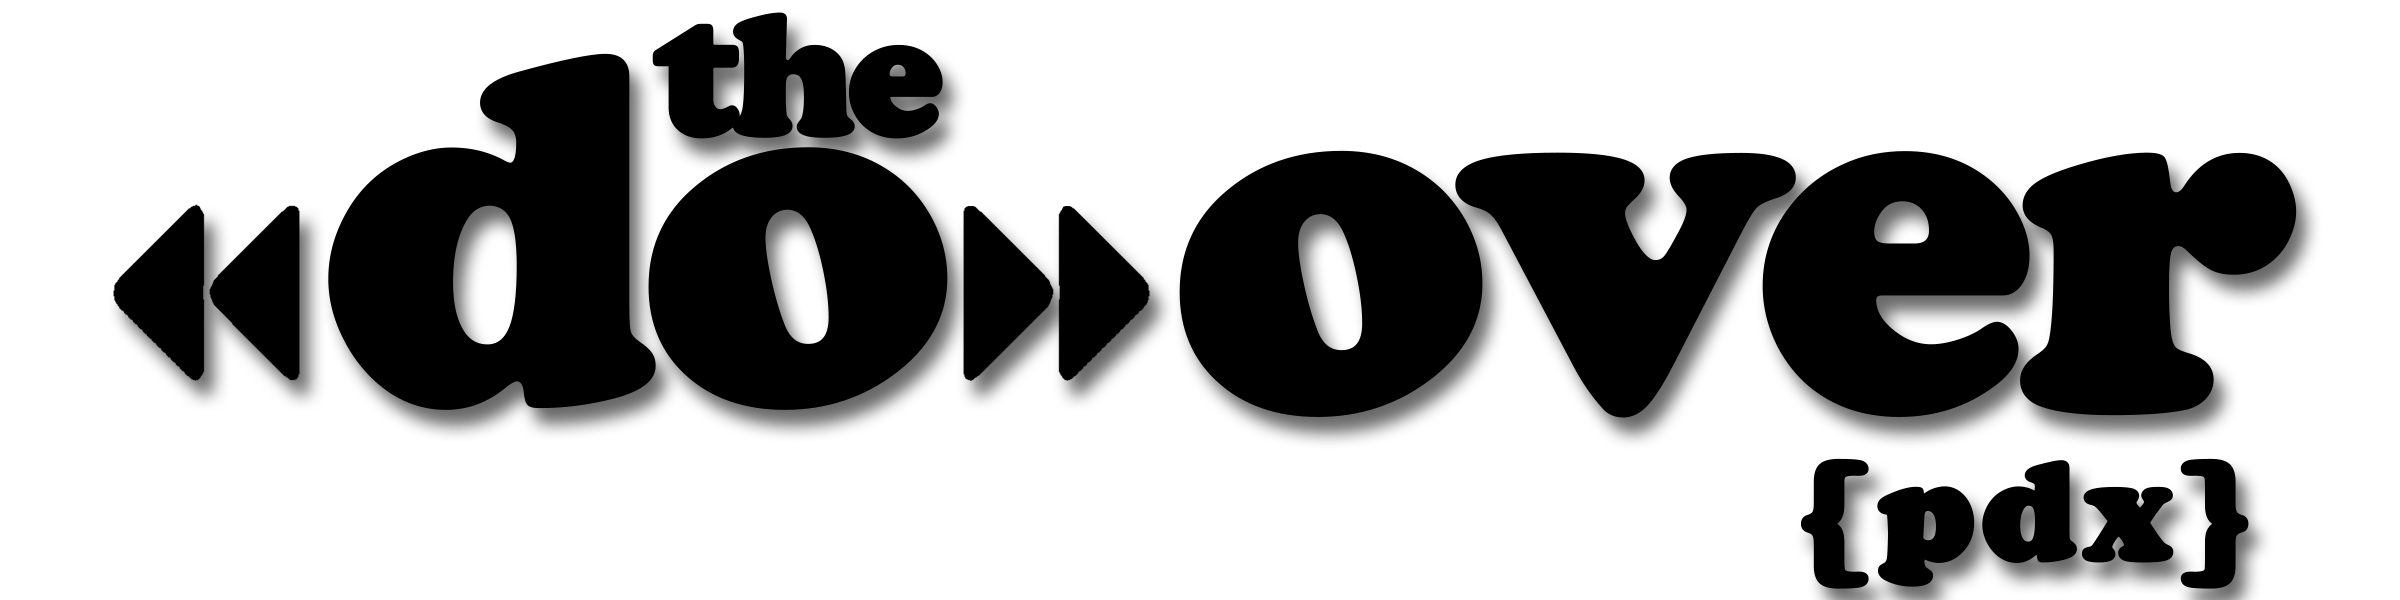 the-do-over-portland-logo-black-shadow.png